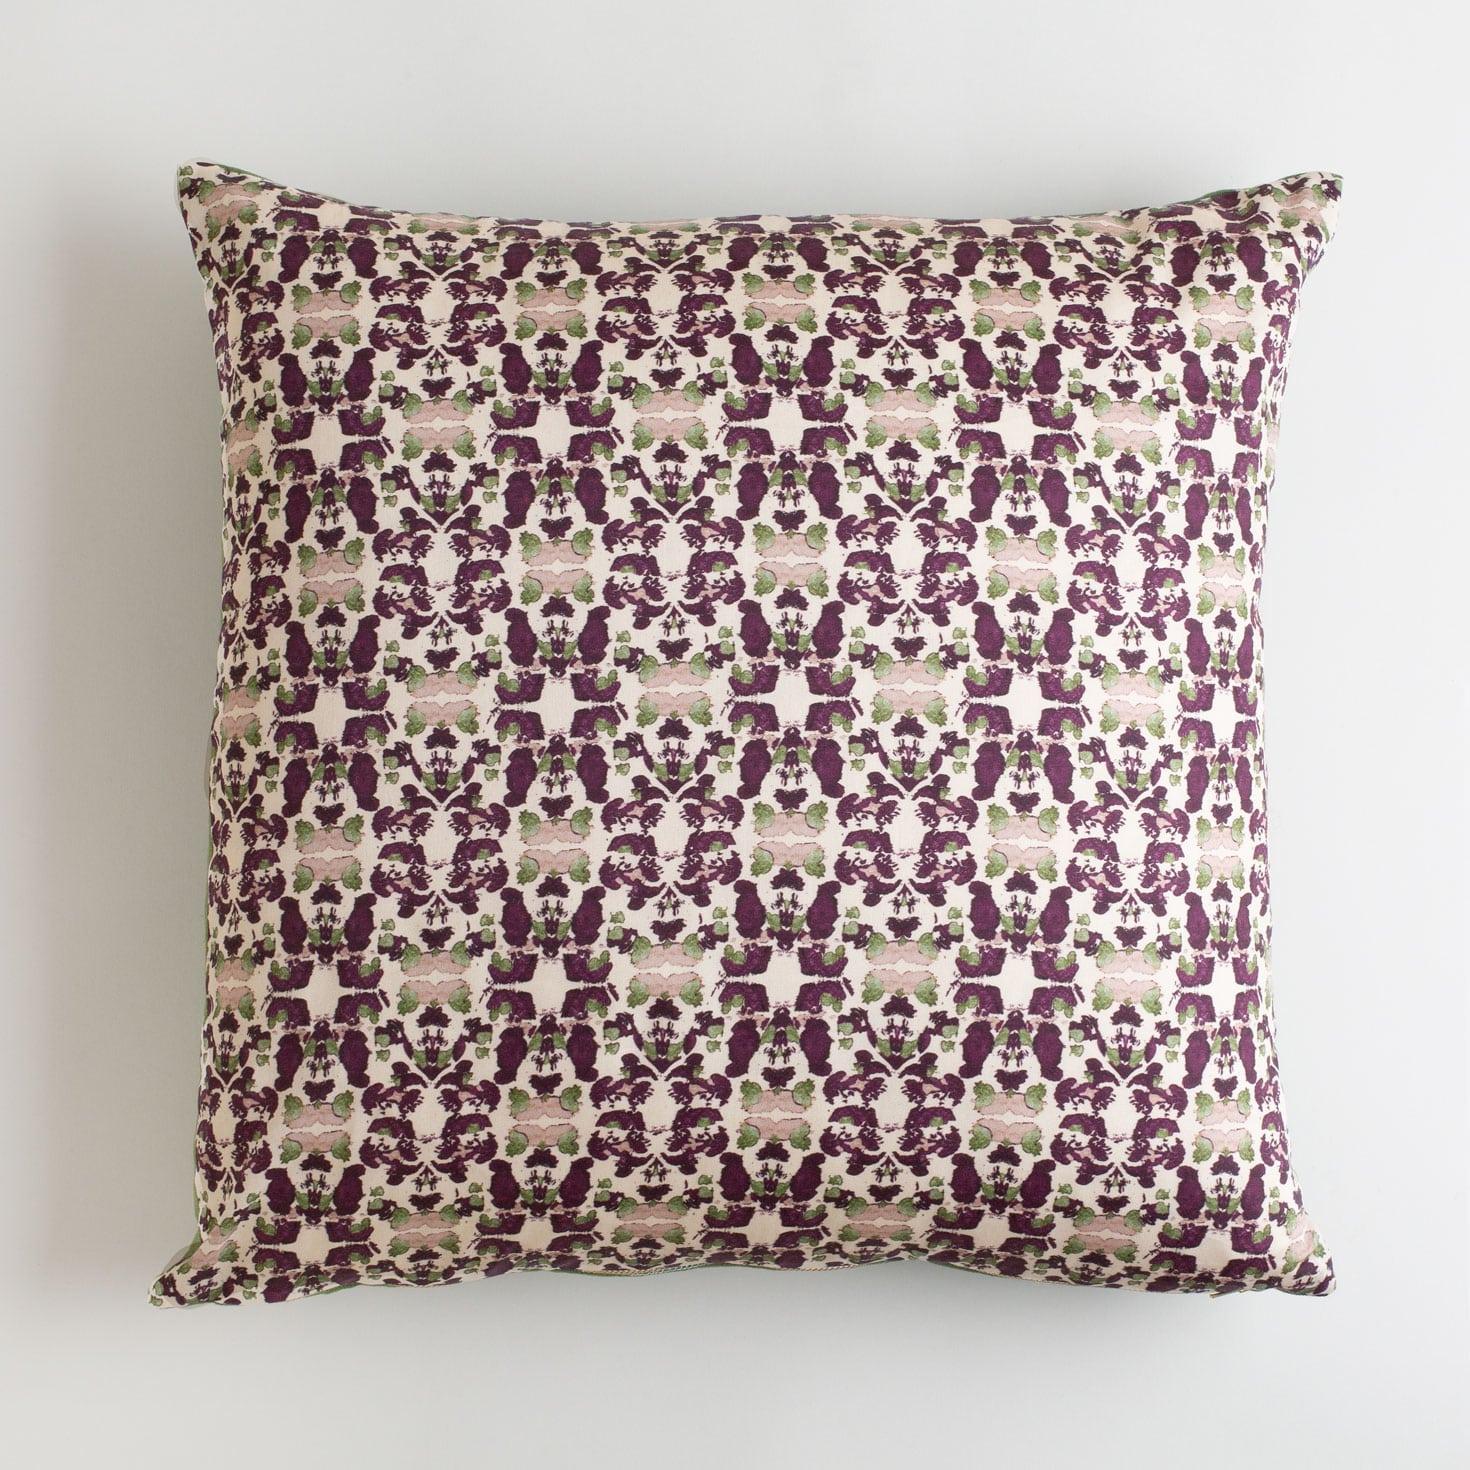 Beach Rose Merlot and Sage Pillow made from organic cotton pillow